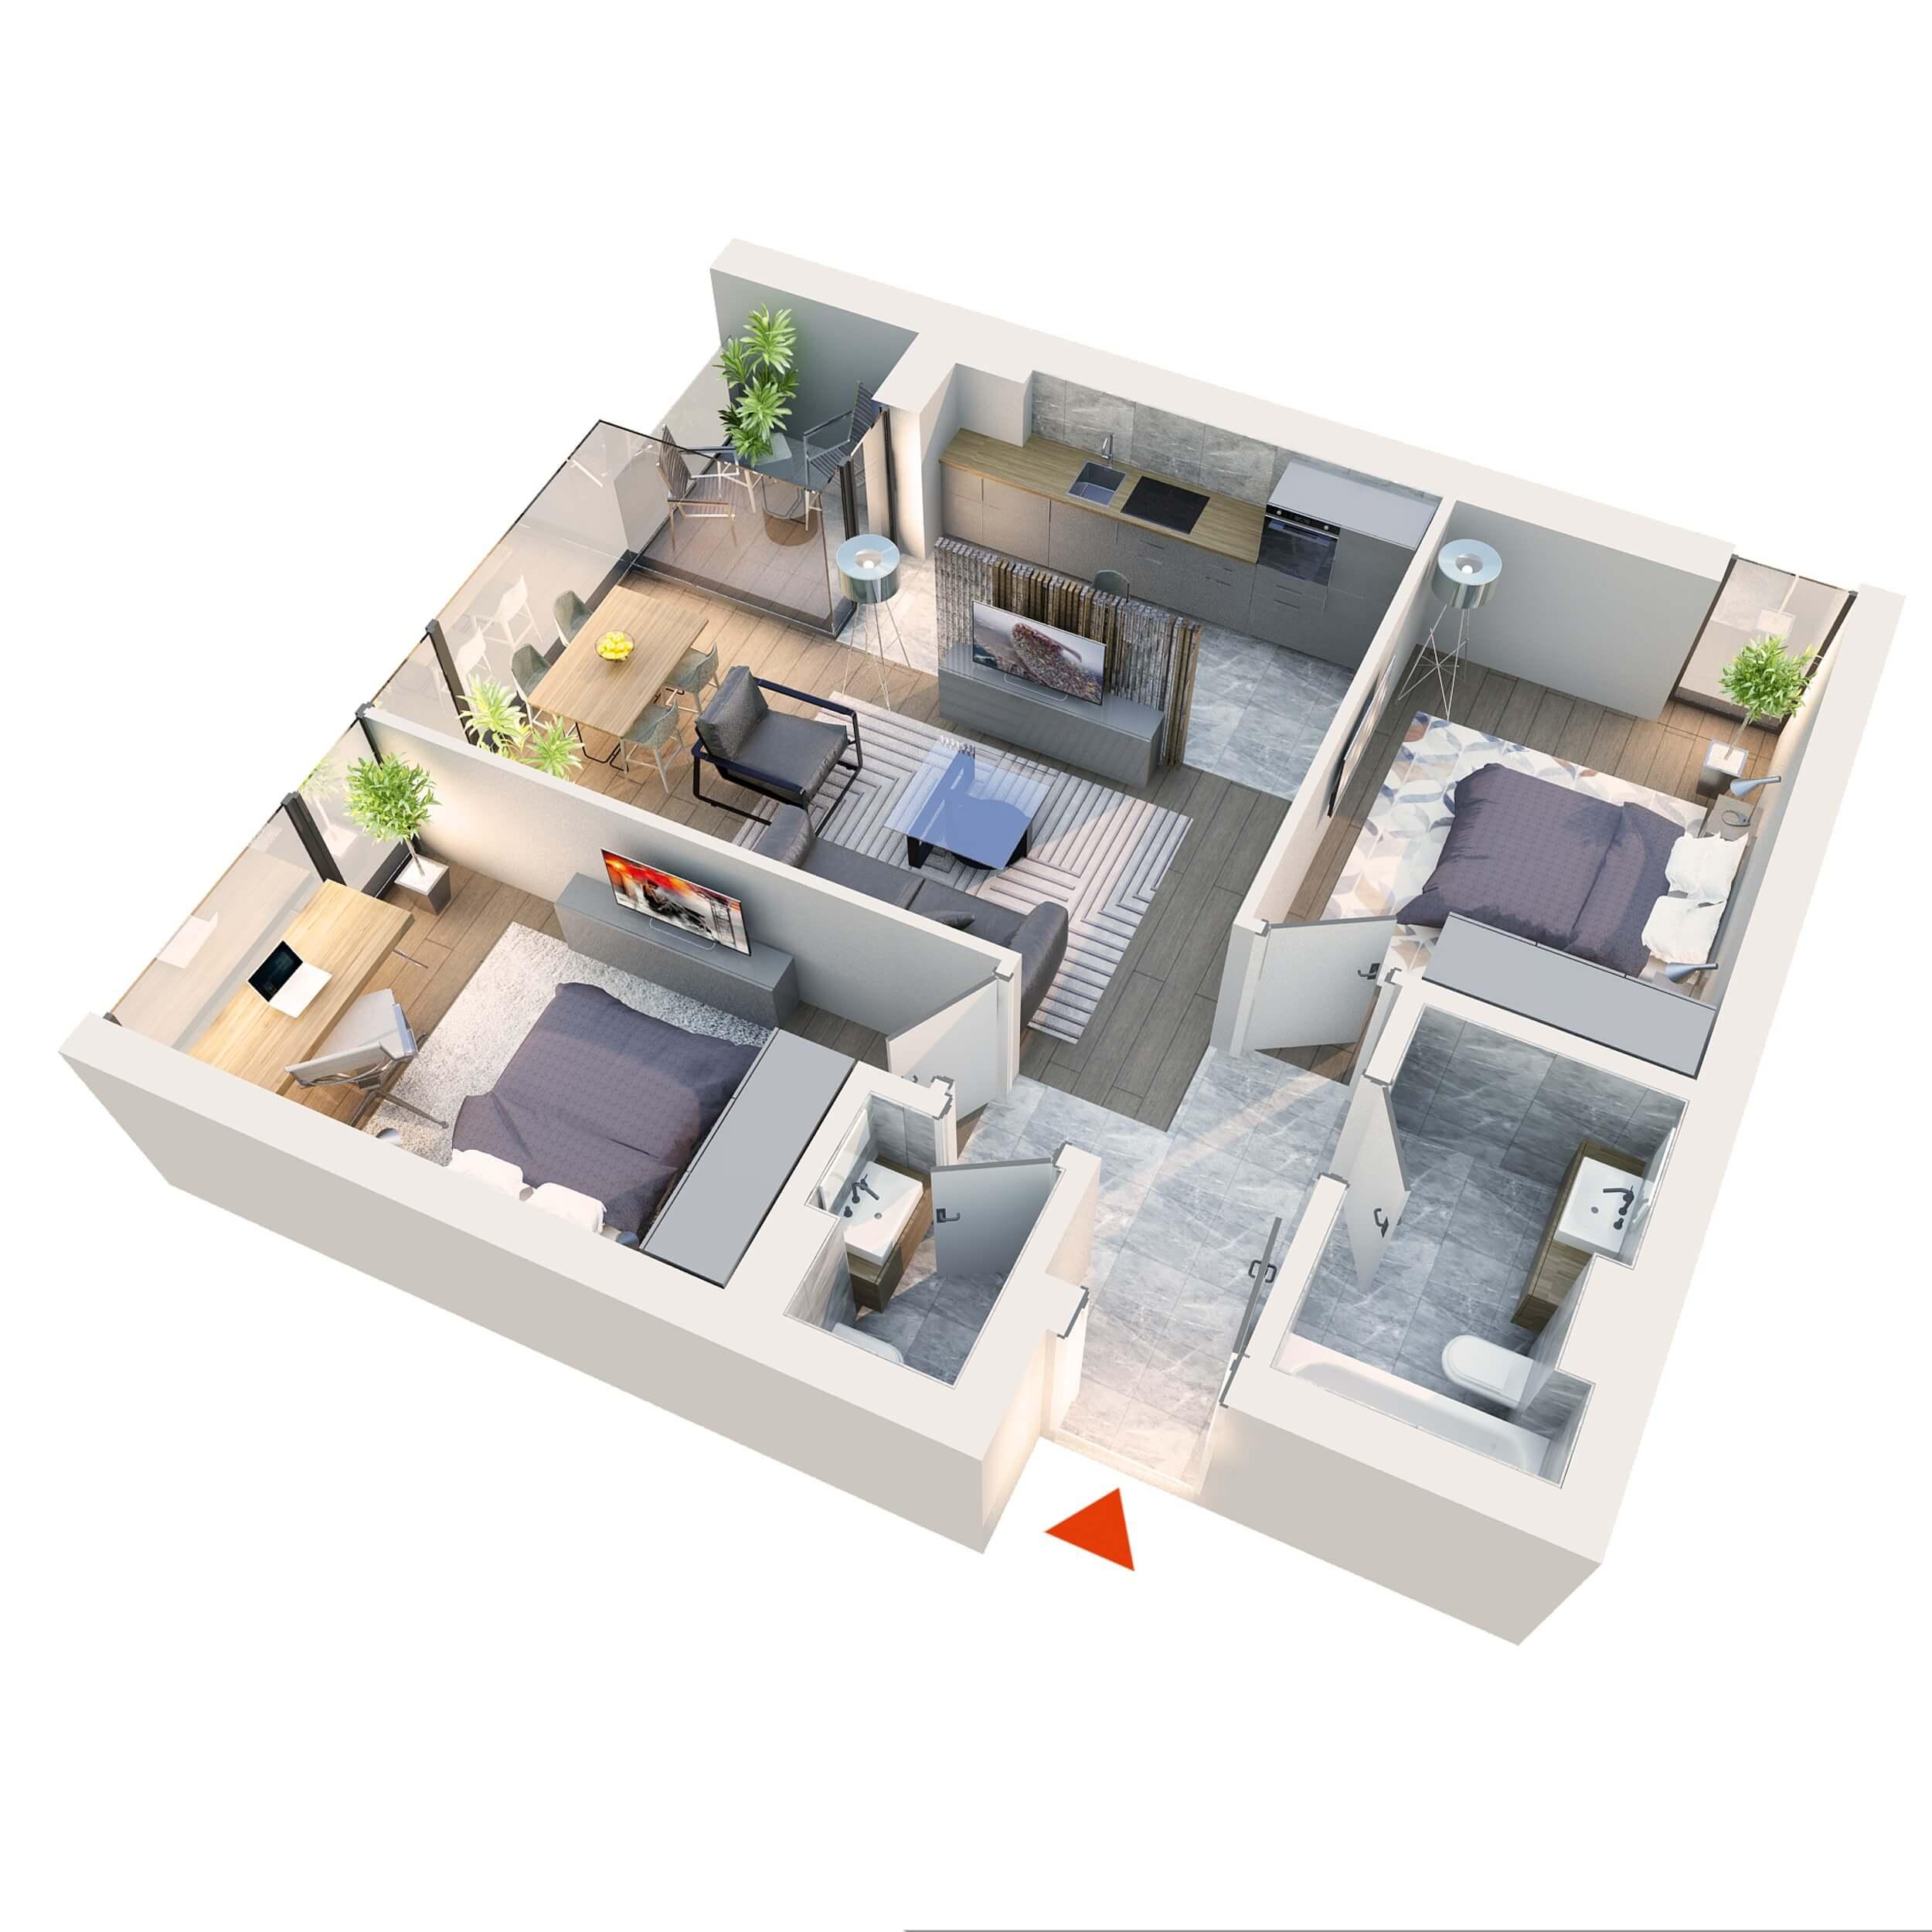 Apartament 3 camere tip 3D3 | Balcon | Etaj 1 – 6 | Corp C7 C8 | Faza 2